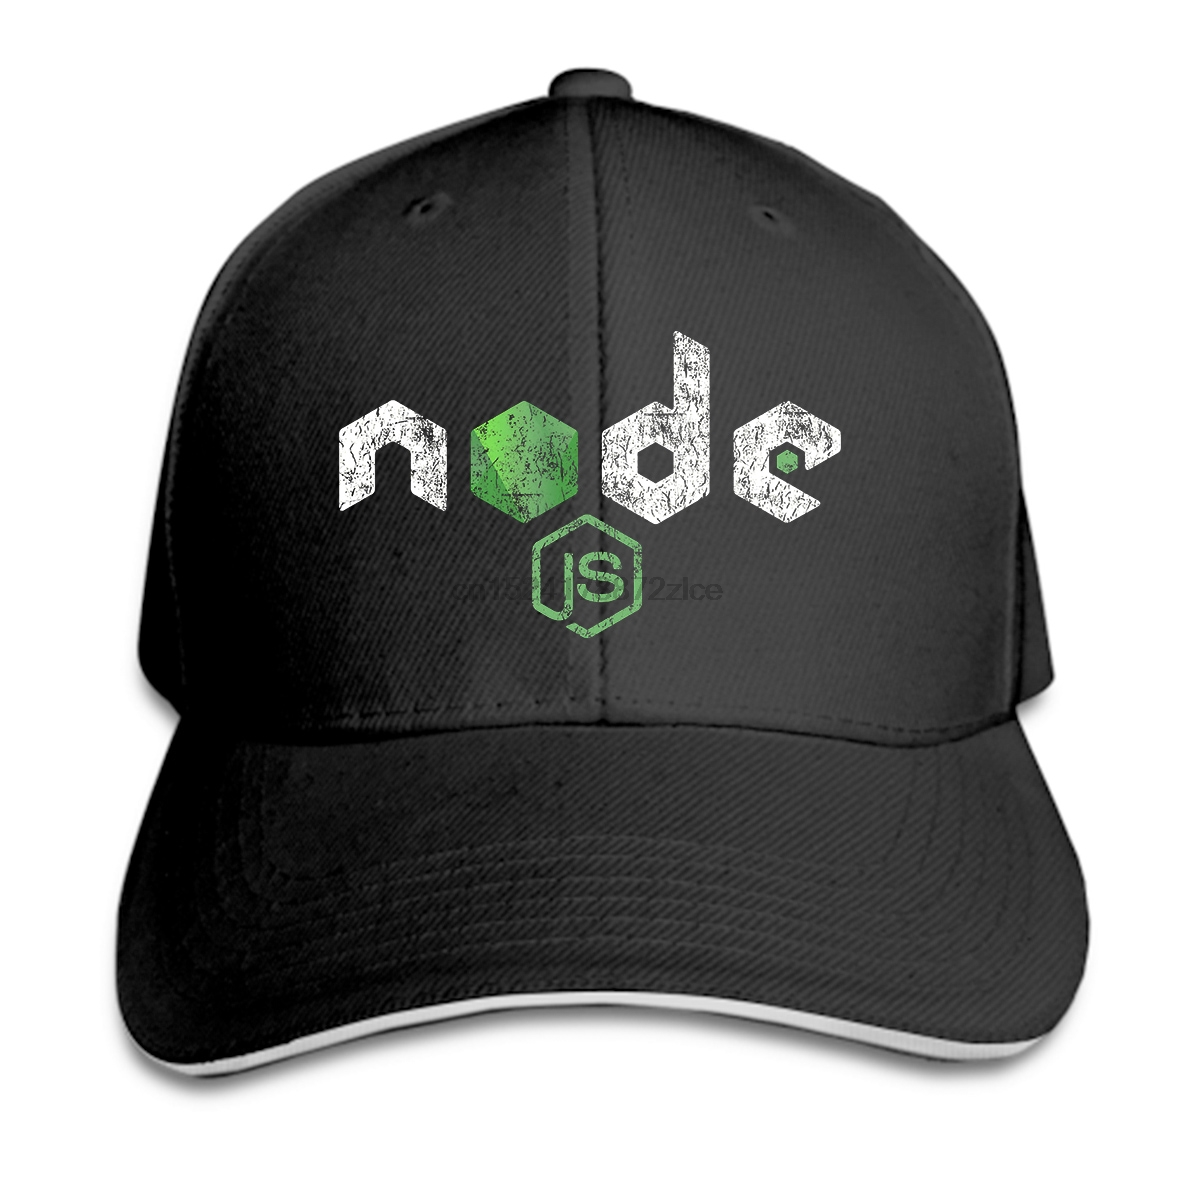 Print Custom Baseball Cap Men Vintage Distressed NodeJS JavaScript Programmer Women Hat Peaked cap